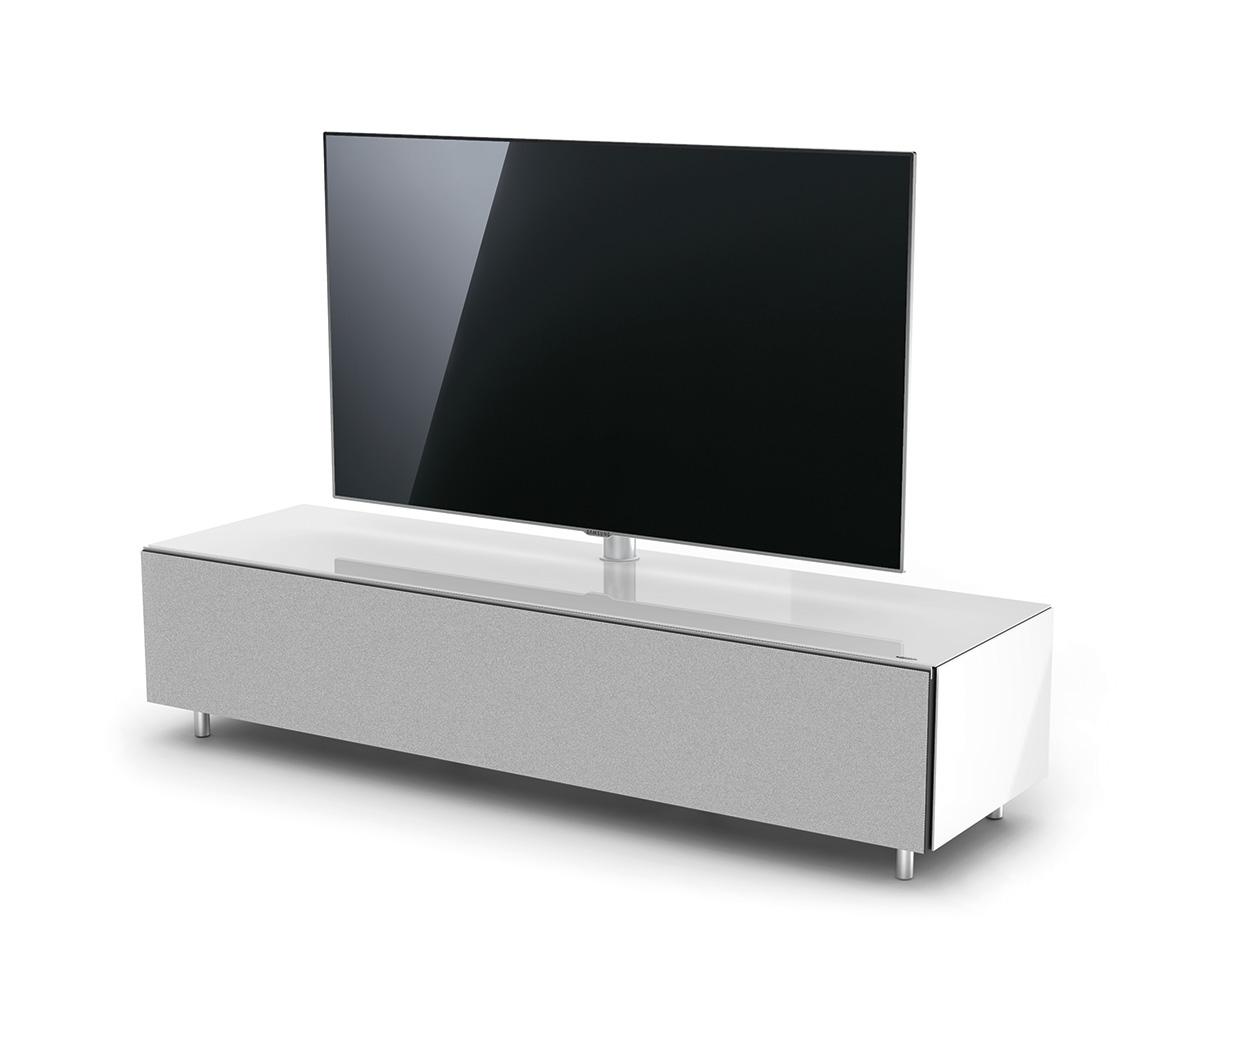 just-racks tv-meubel JRL1654-T-SNG